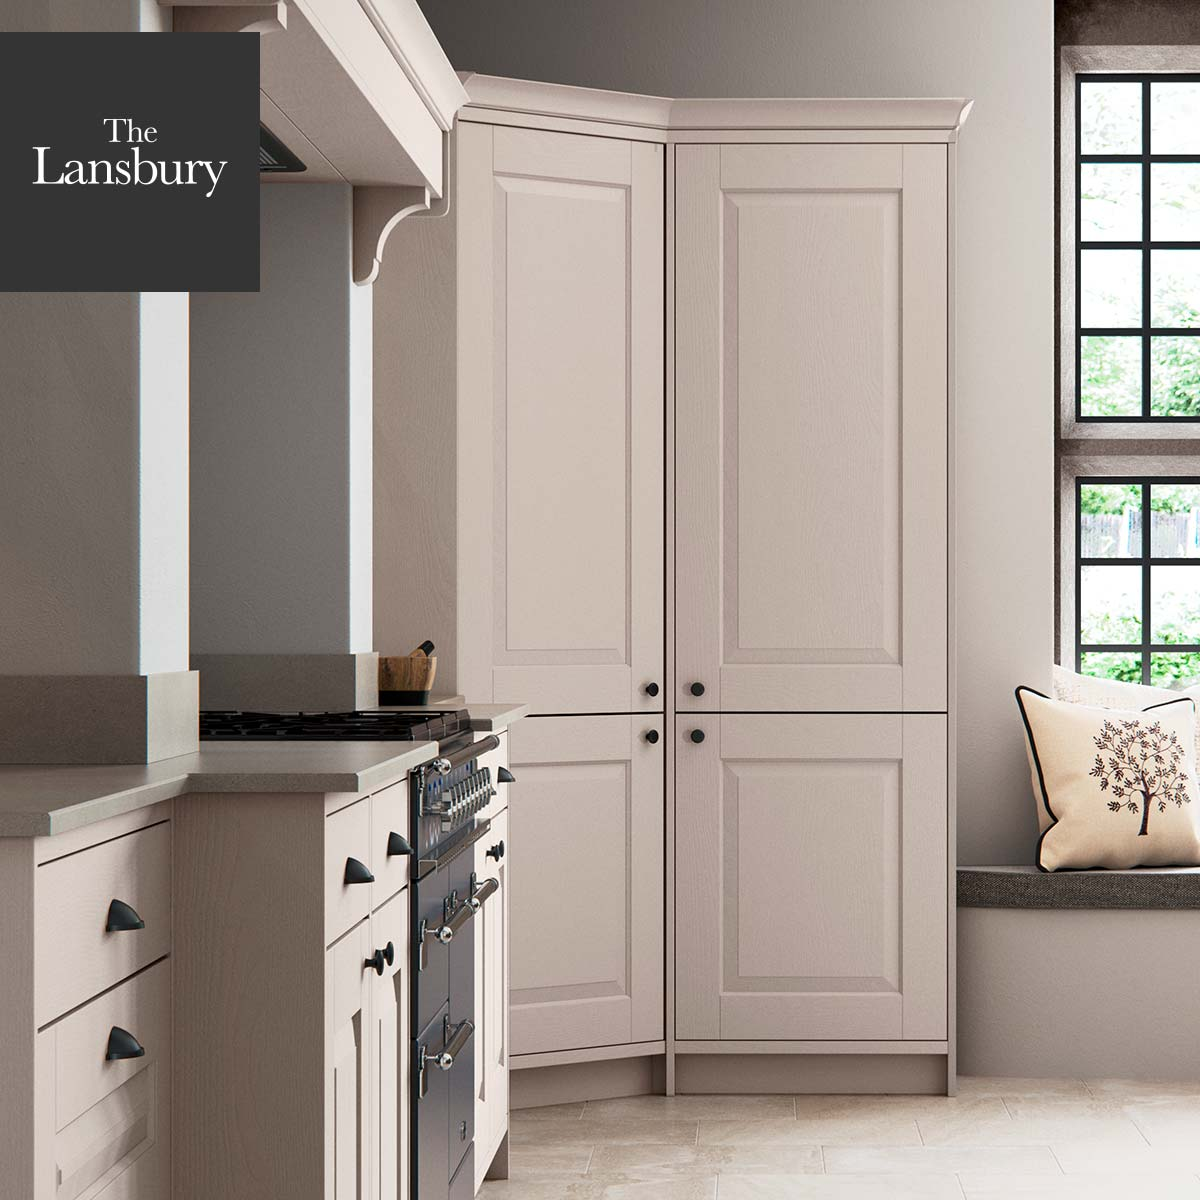 Corner Kitchen Pantry The Lansbury By Masterclass Kitchens